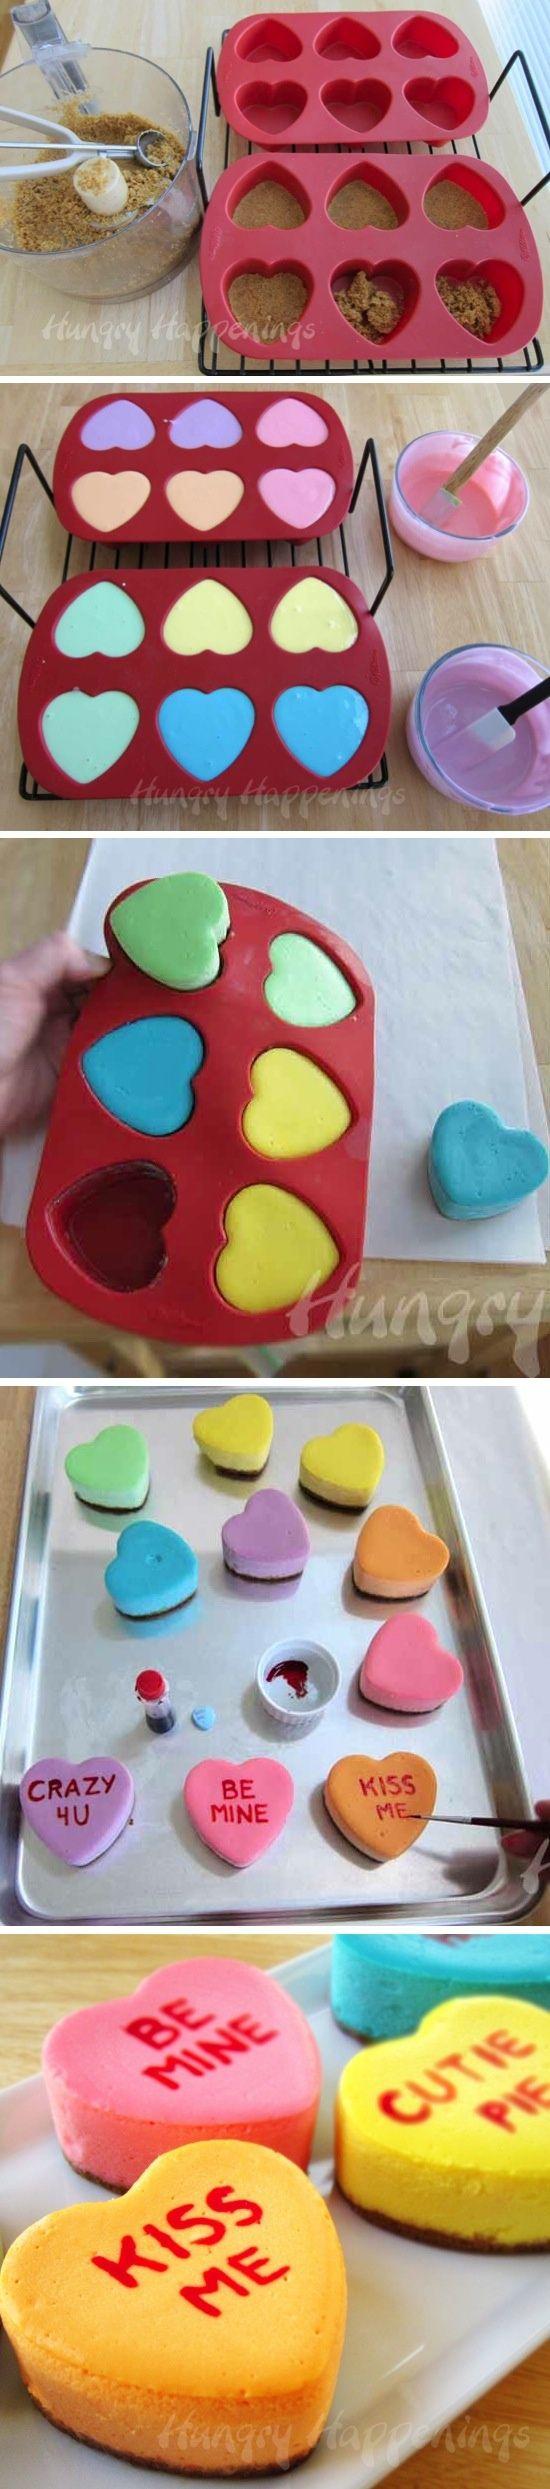 Conversation Heart Cheesecake - Cute!